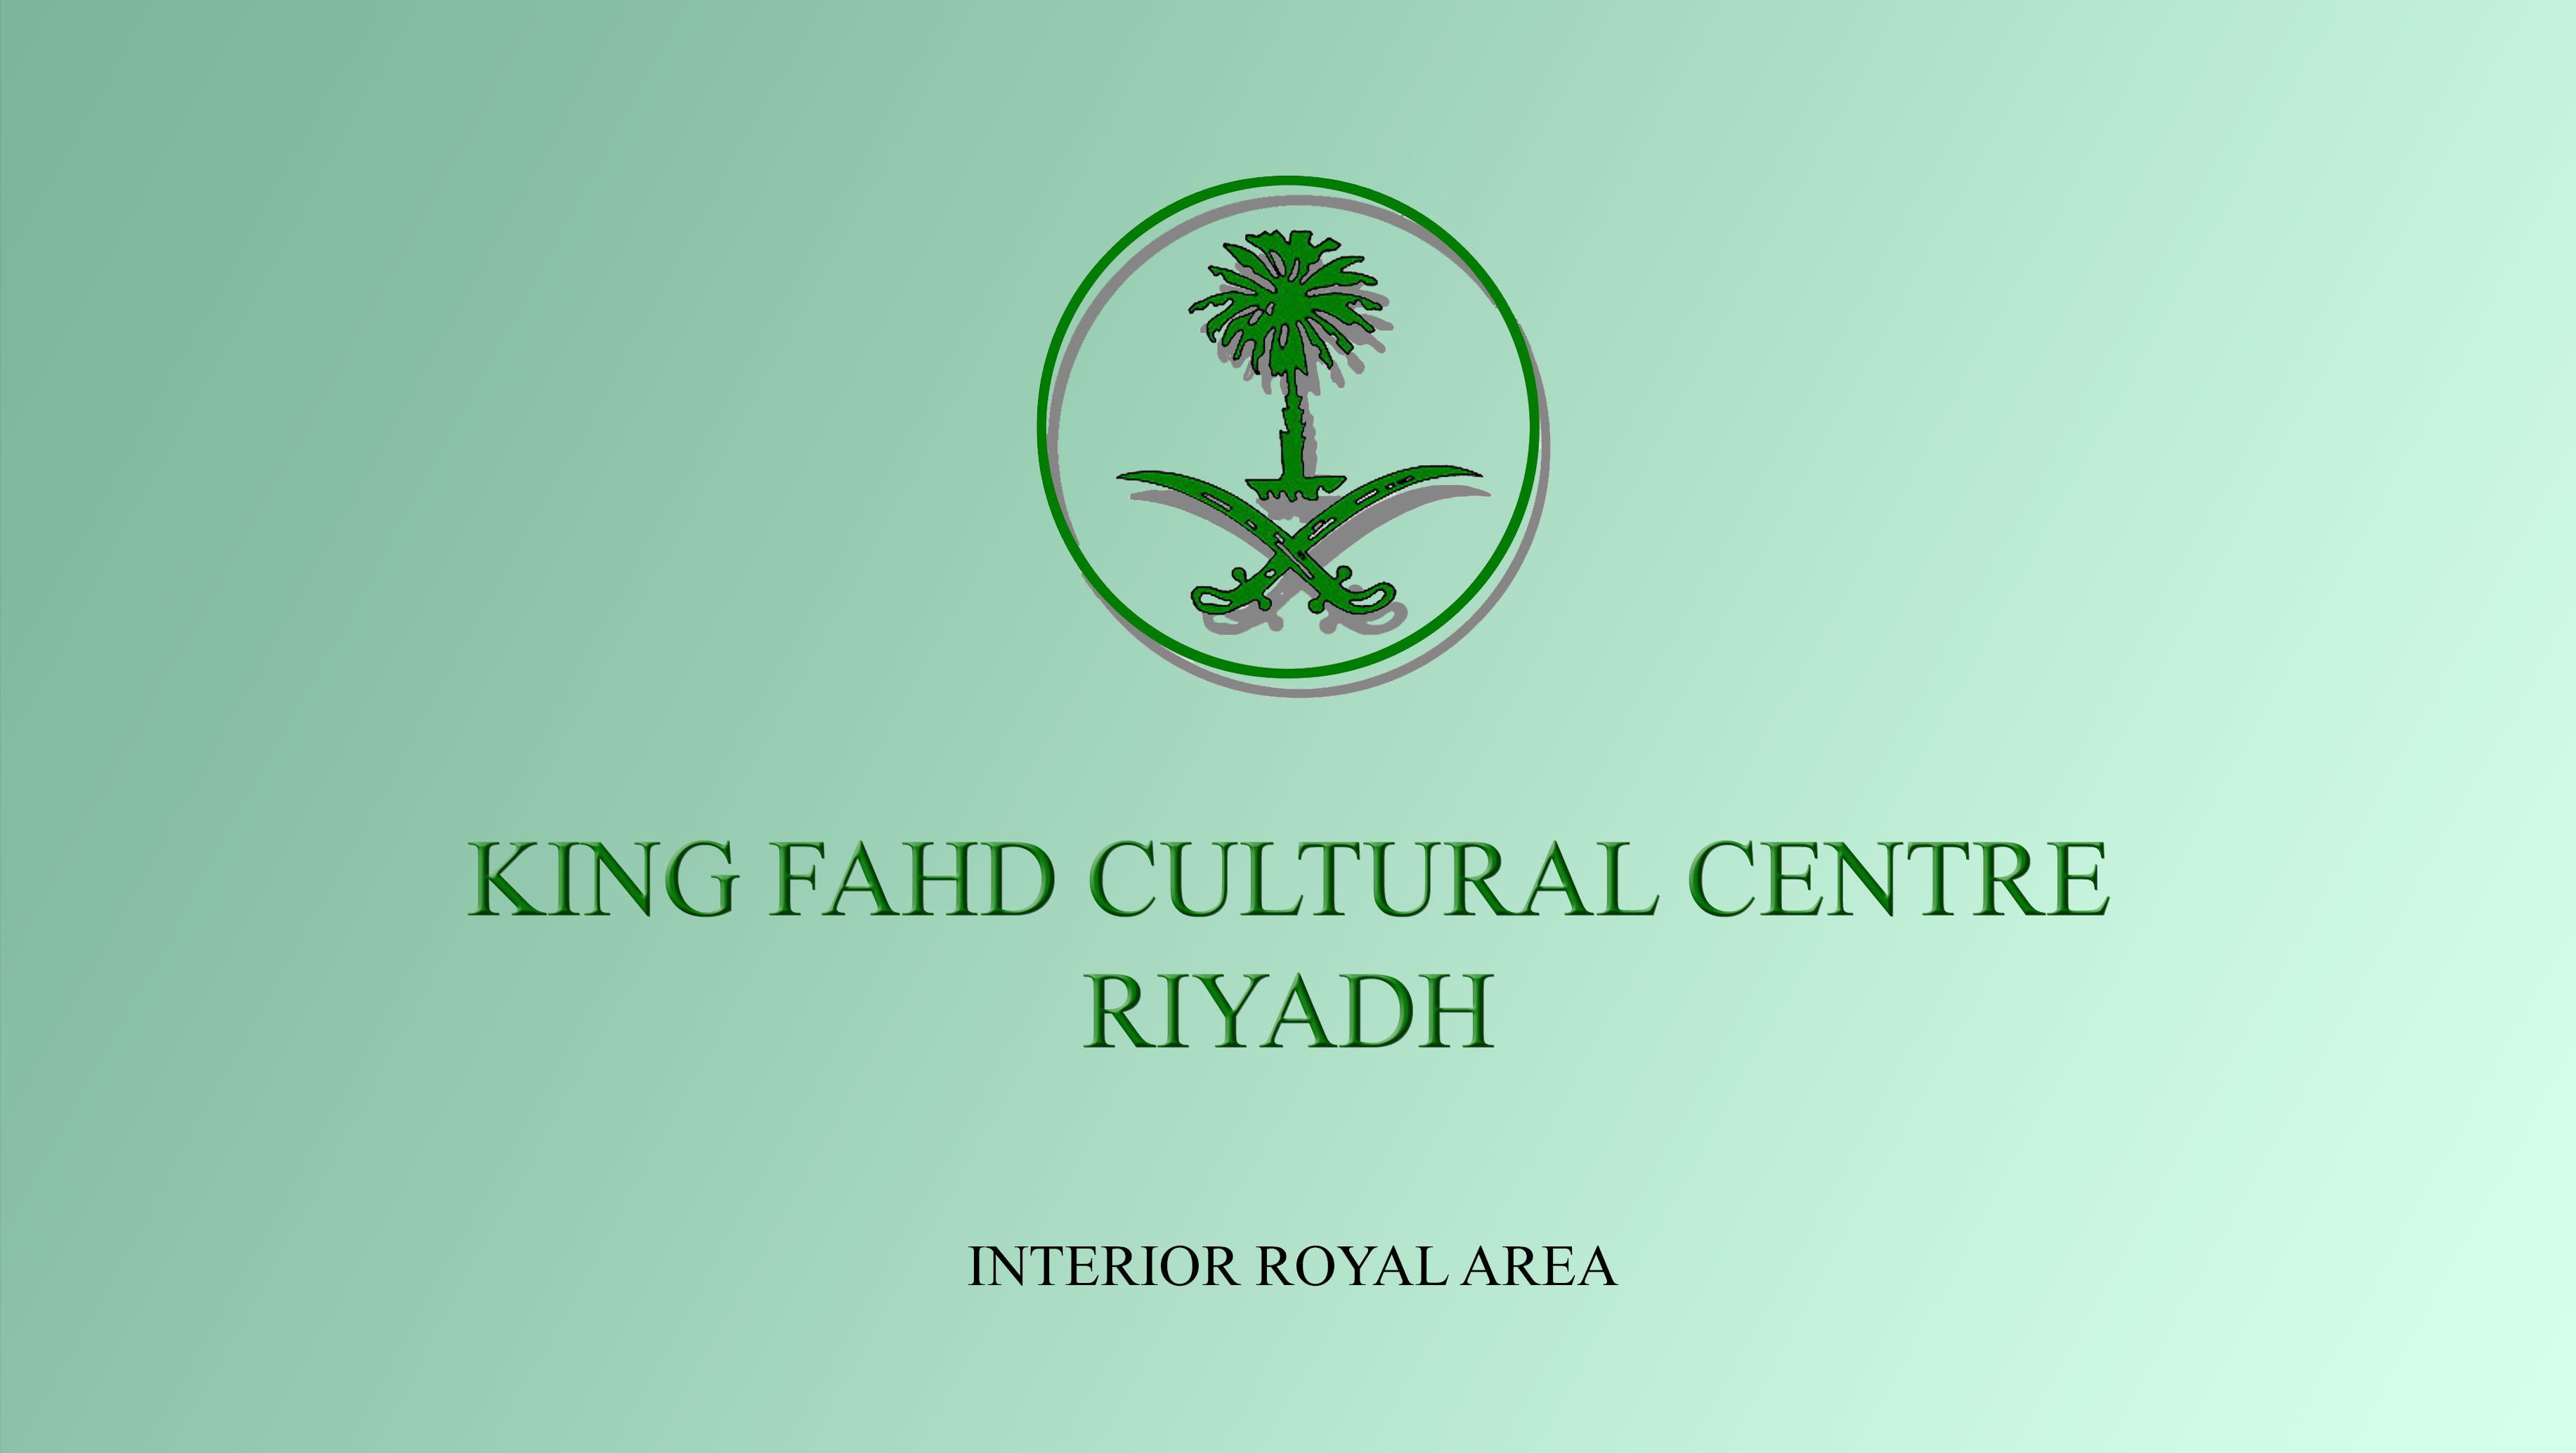 01_CC Riyadh_Title